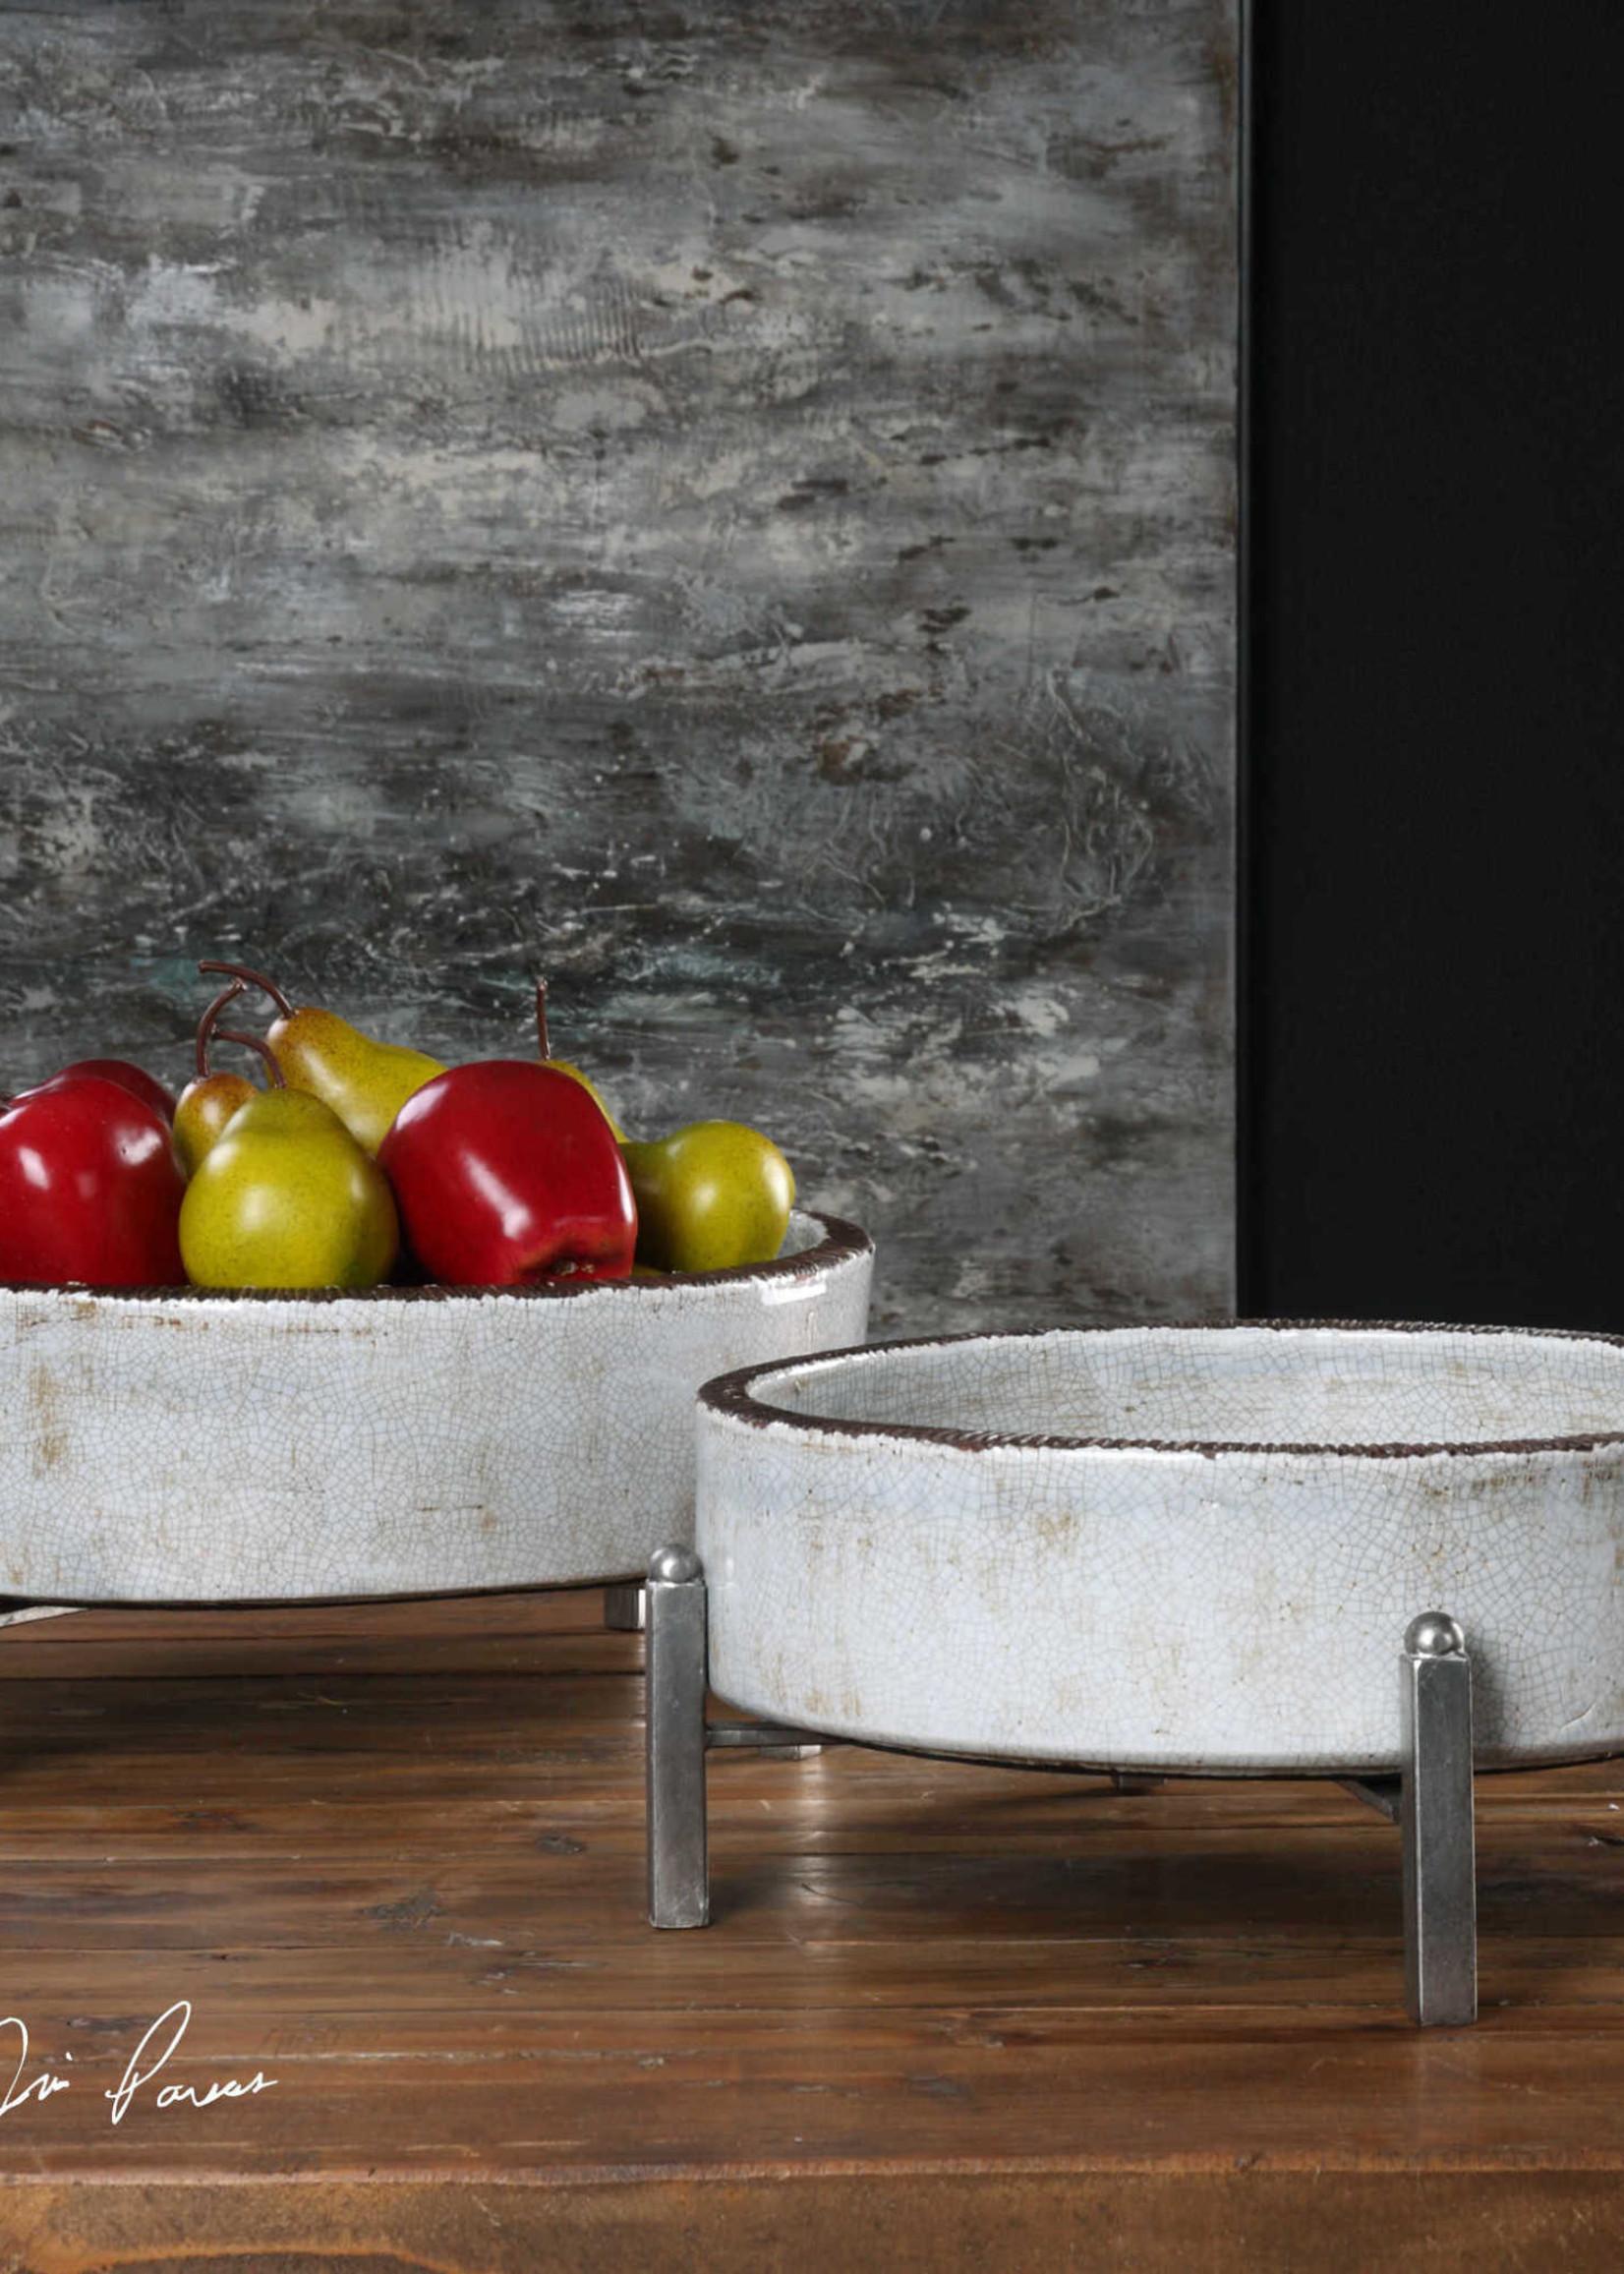 Uttermost / Revelation Essie Bowl in Antiqued Silver - Large